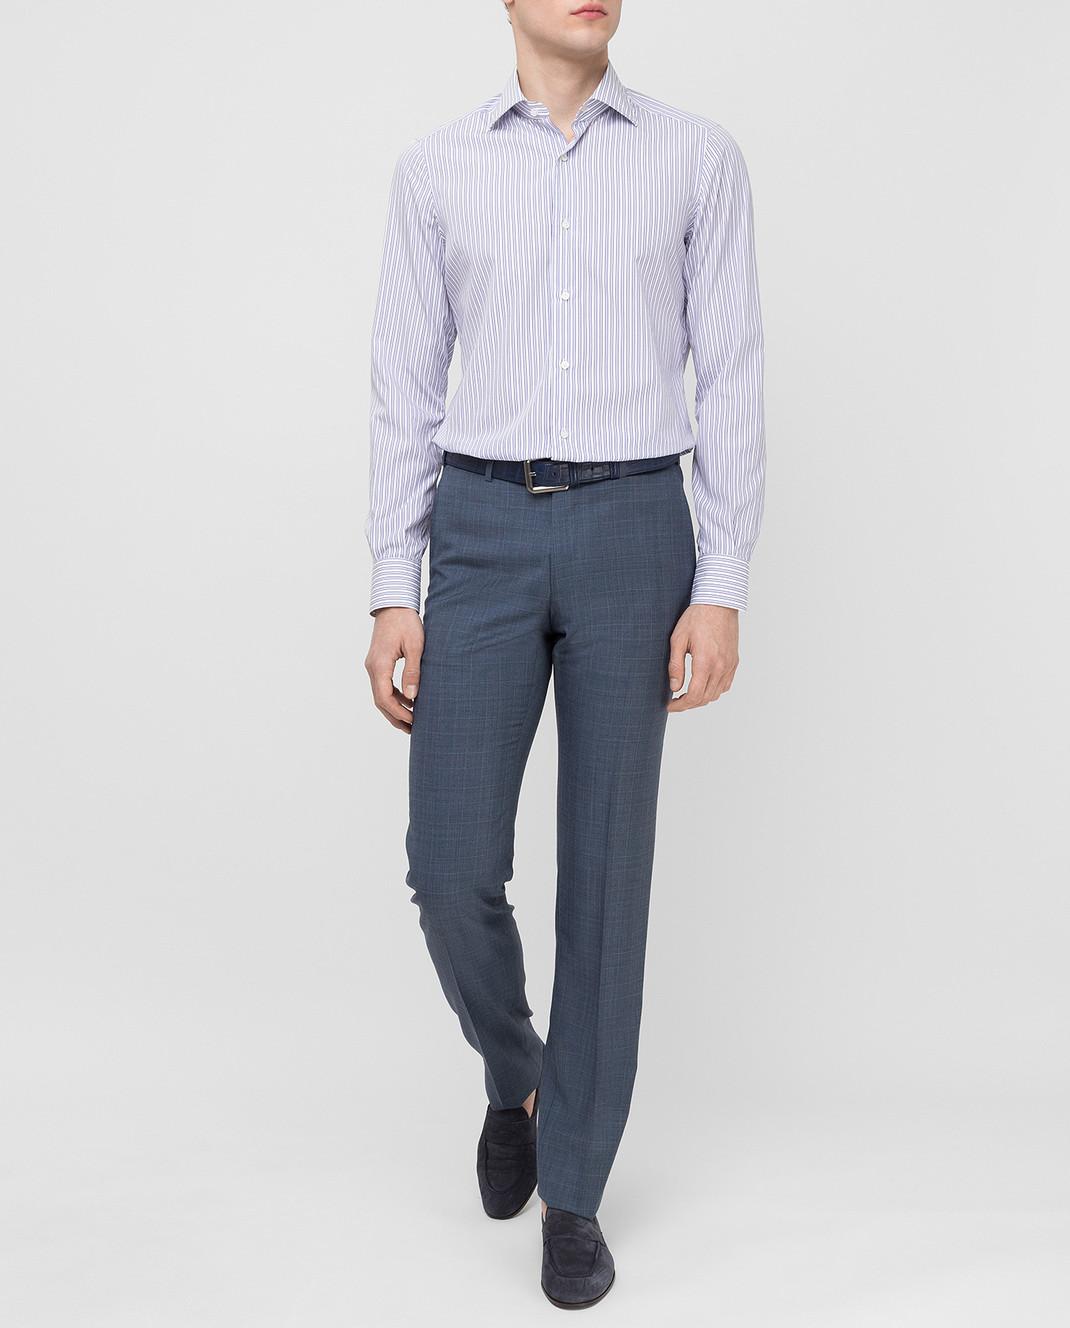 ISAIA Синие брюки из шерсти 0073153629F изображение 2